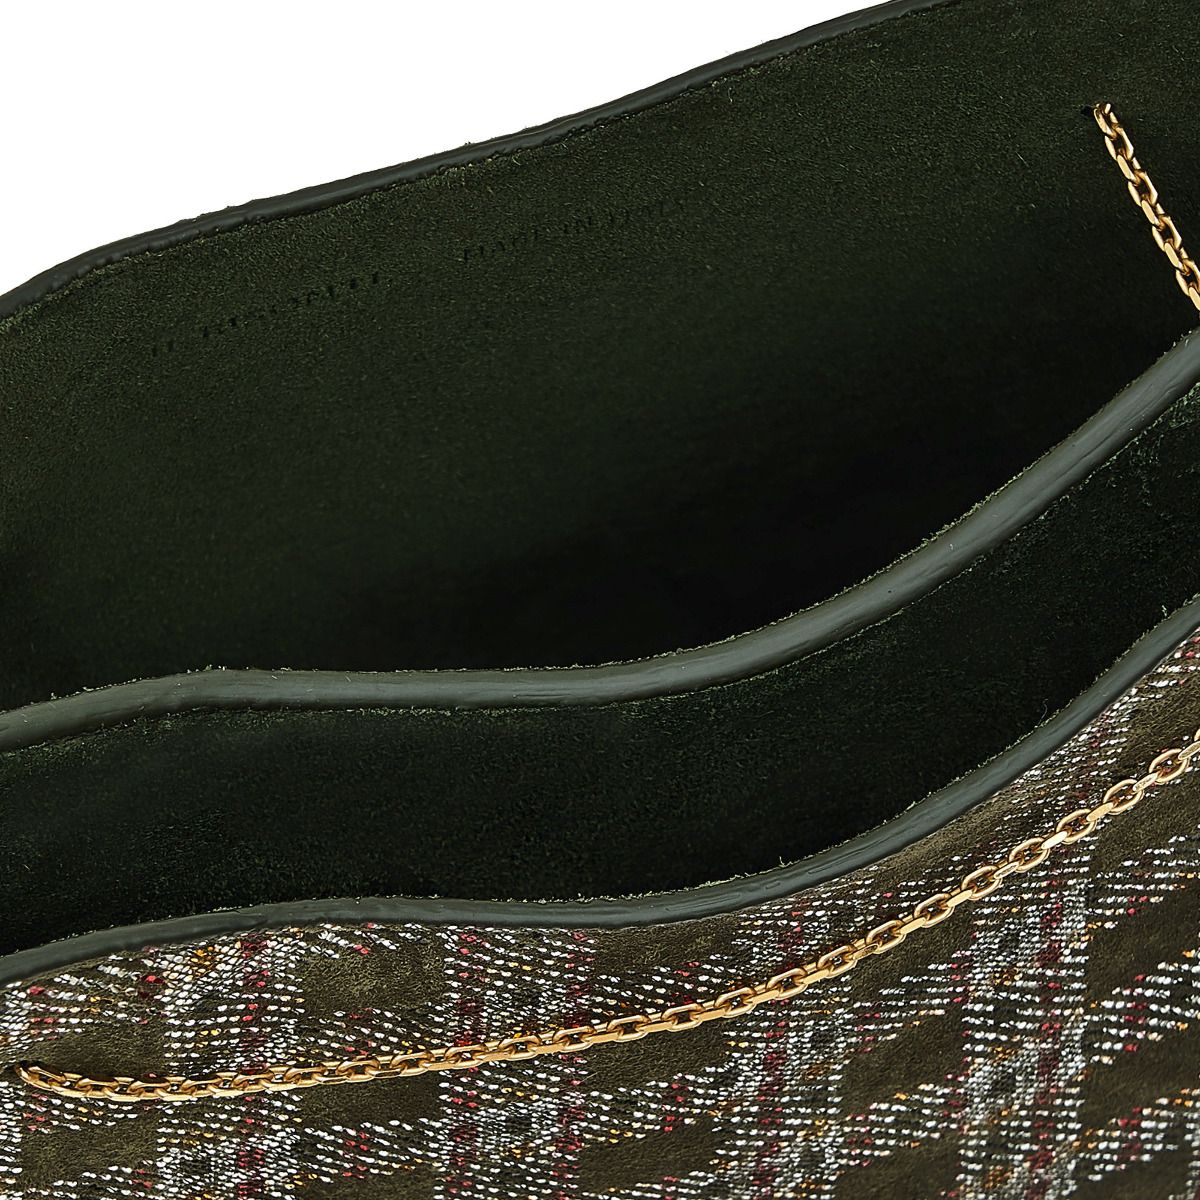 Giglio - Women's Shoulder Bag in Check Printed Suede/Glitter color Green - Mediterranea line BSH132 | Details